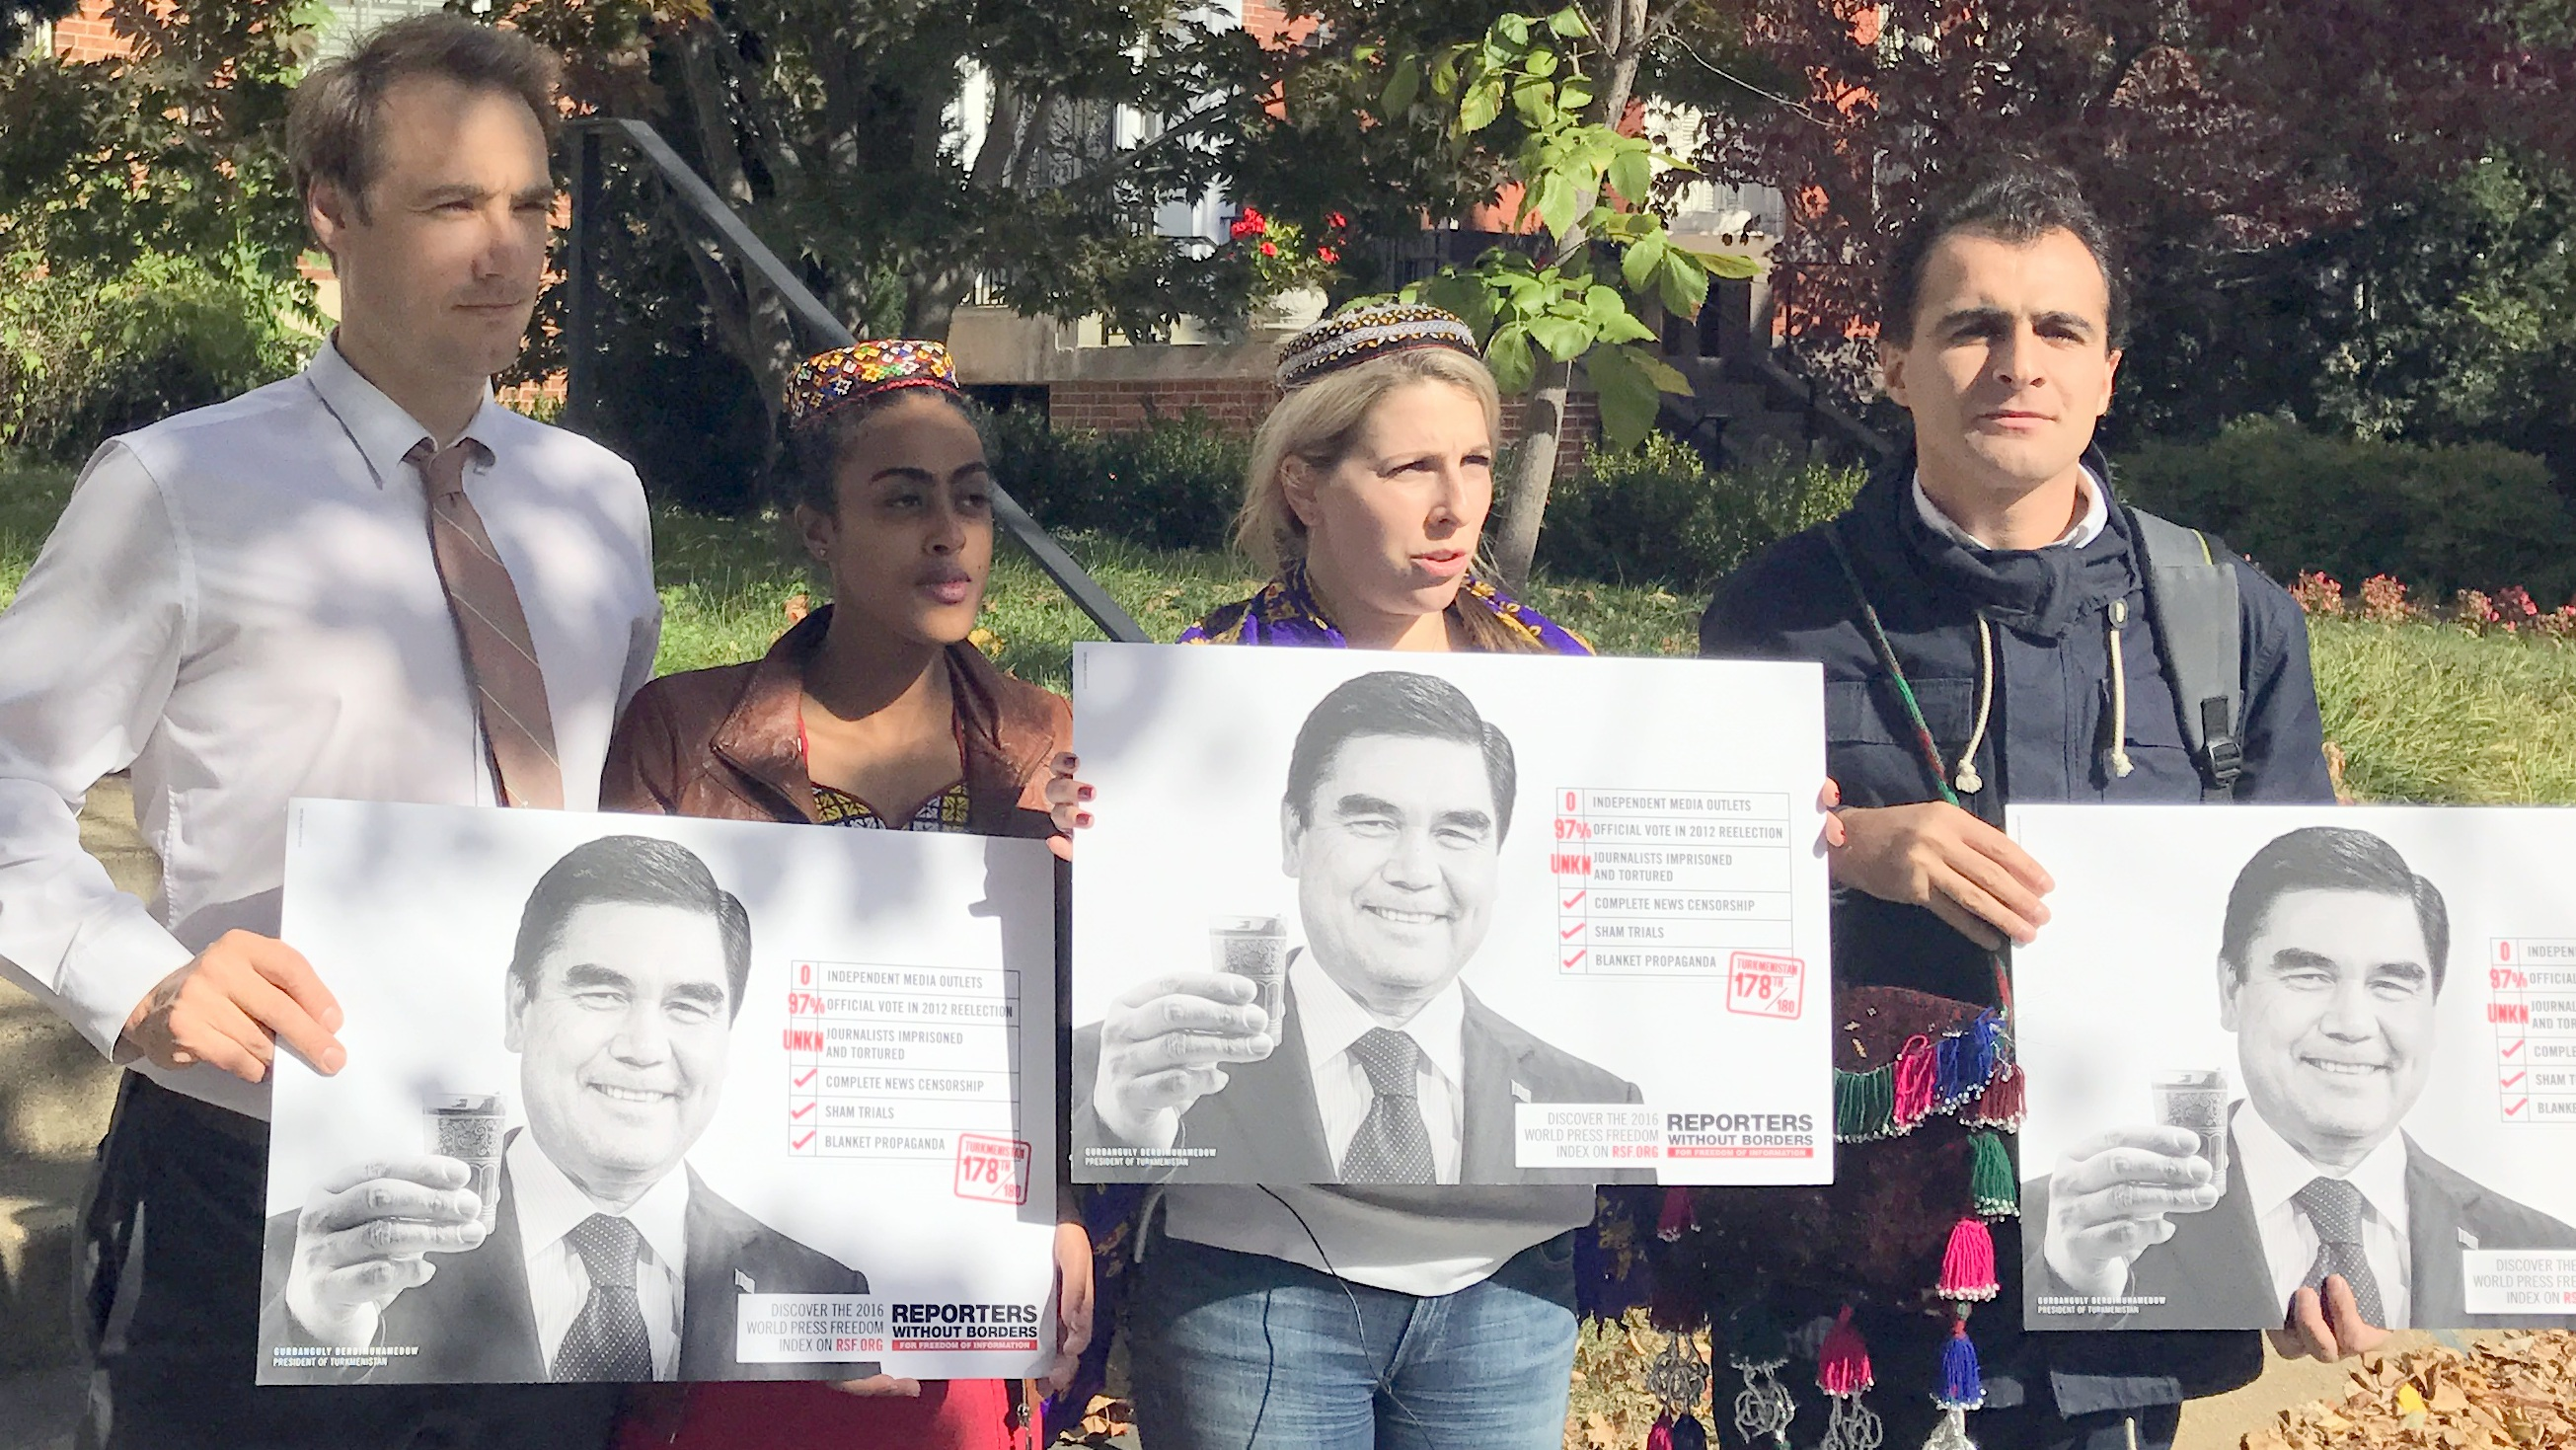 Washington rally marks Nepeskuliev detention